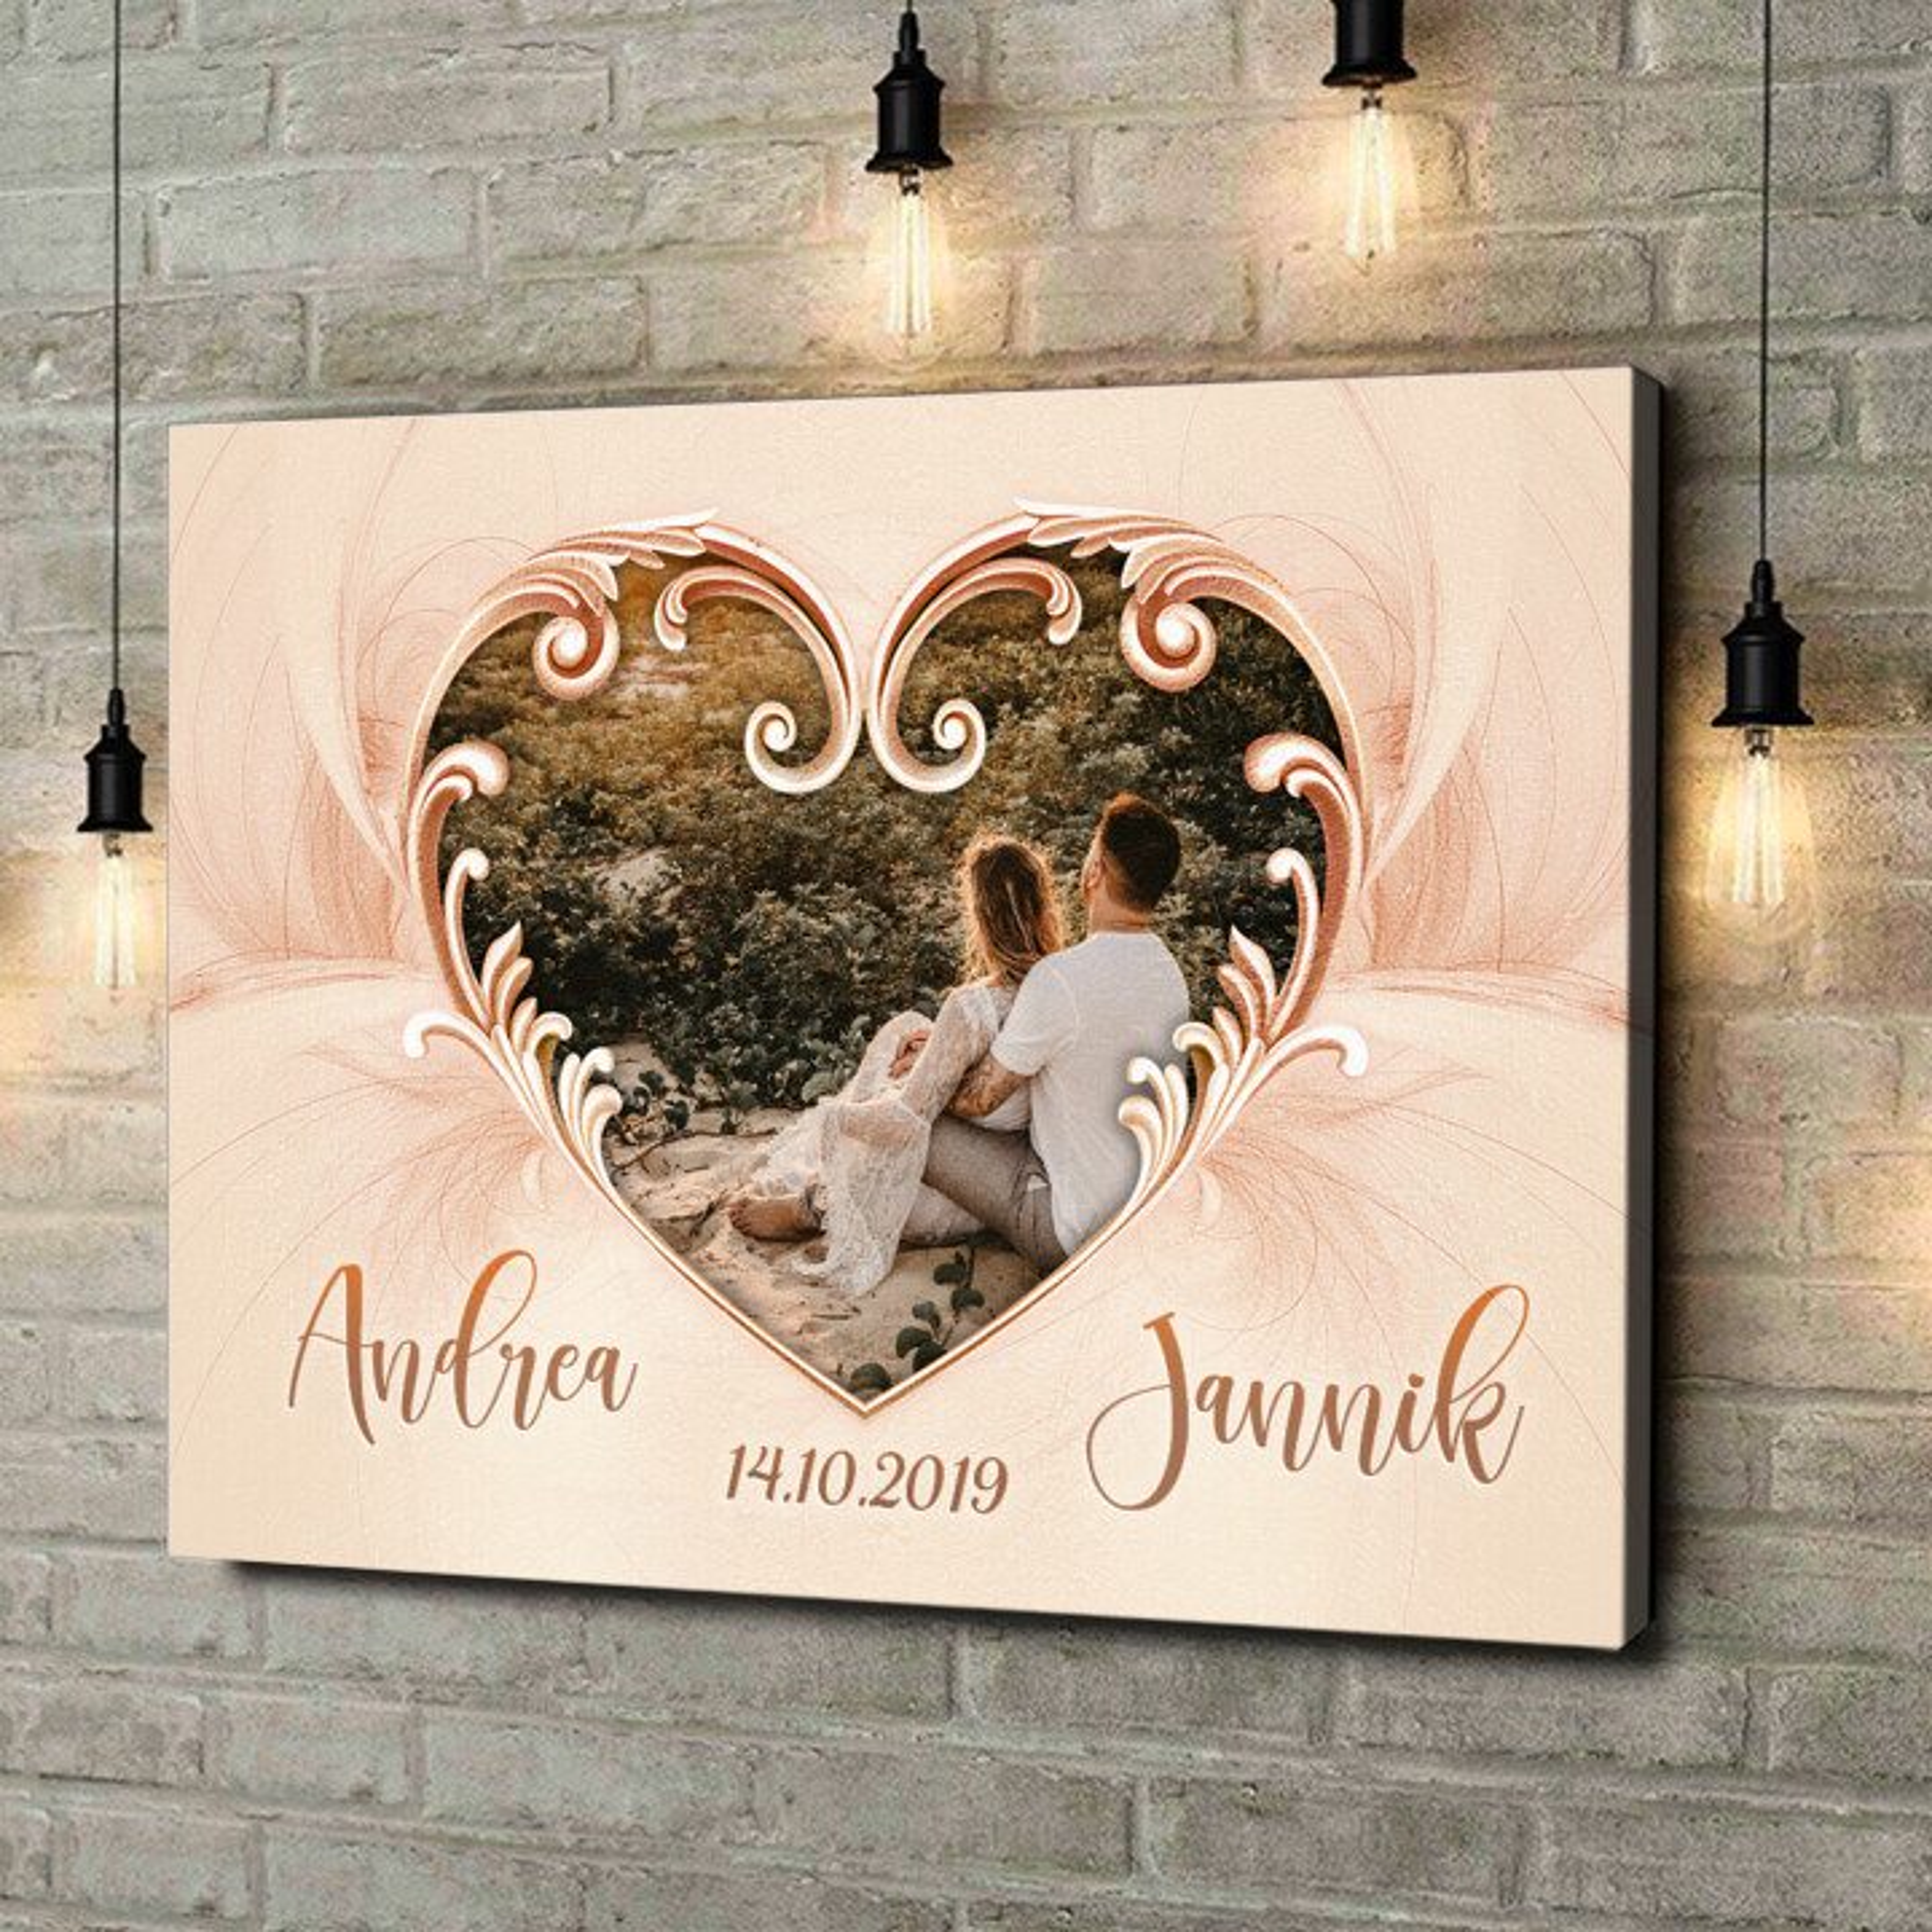 Leinwandbild personalisiert Segen der Liebe